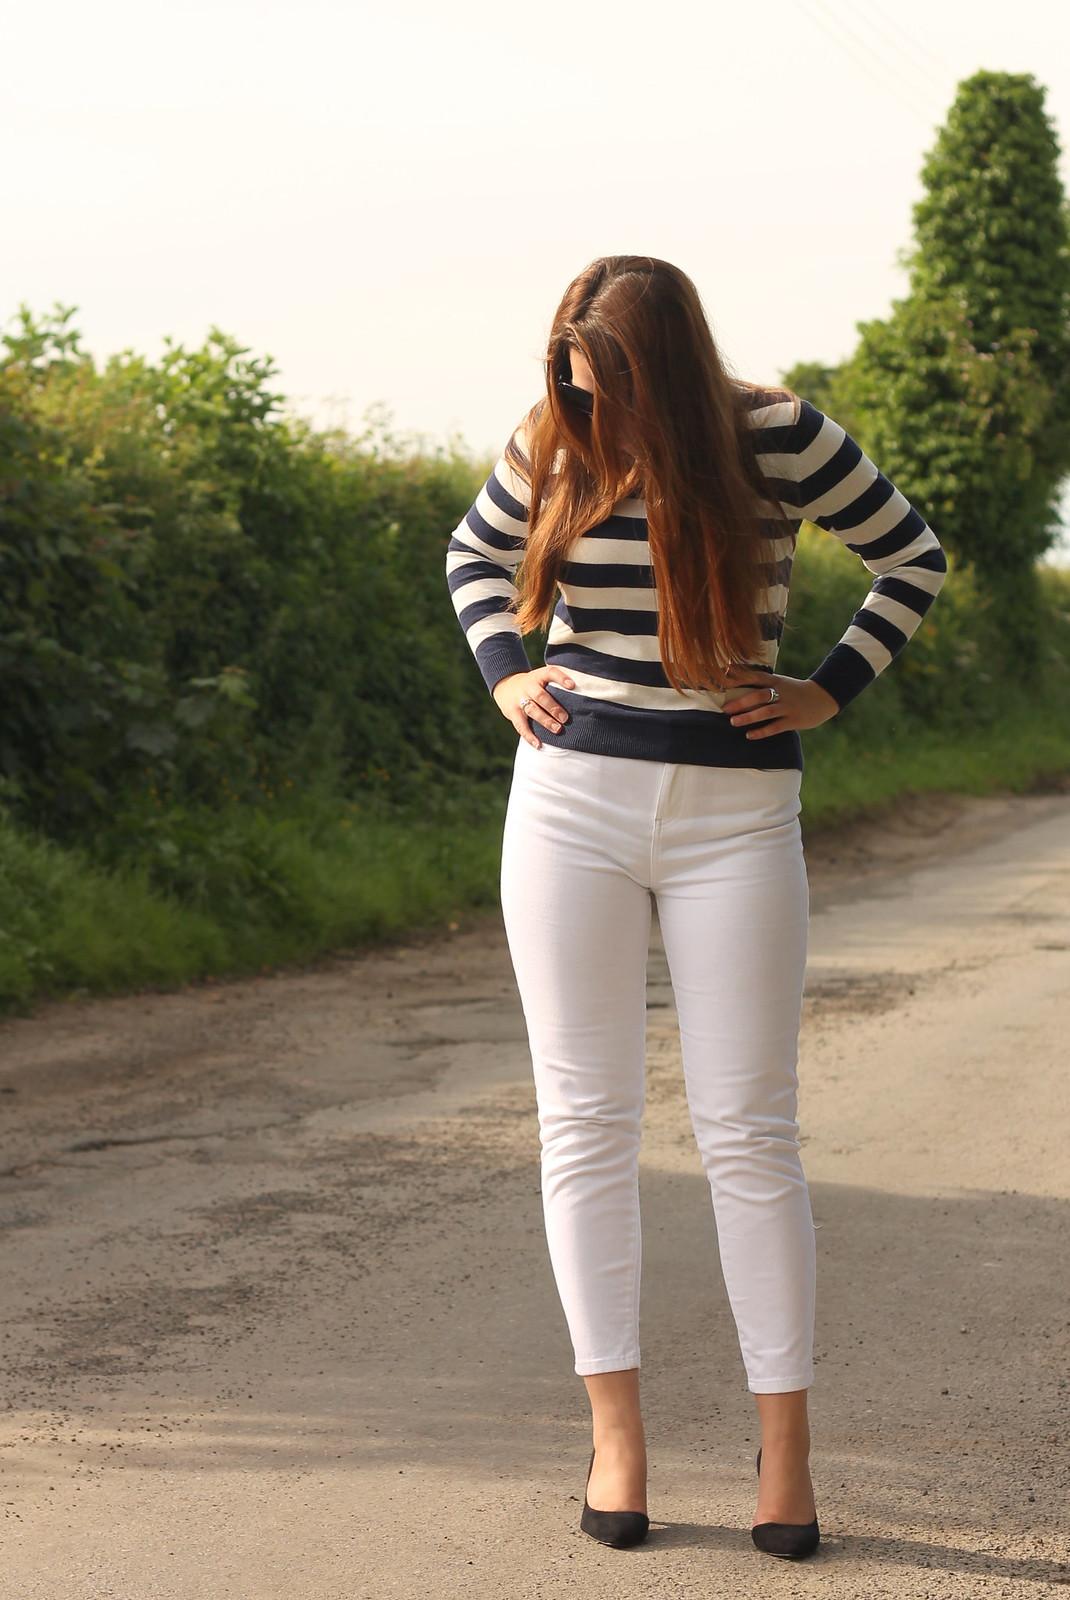 White capris with stripes